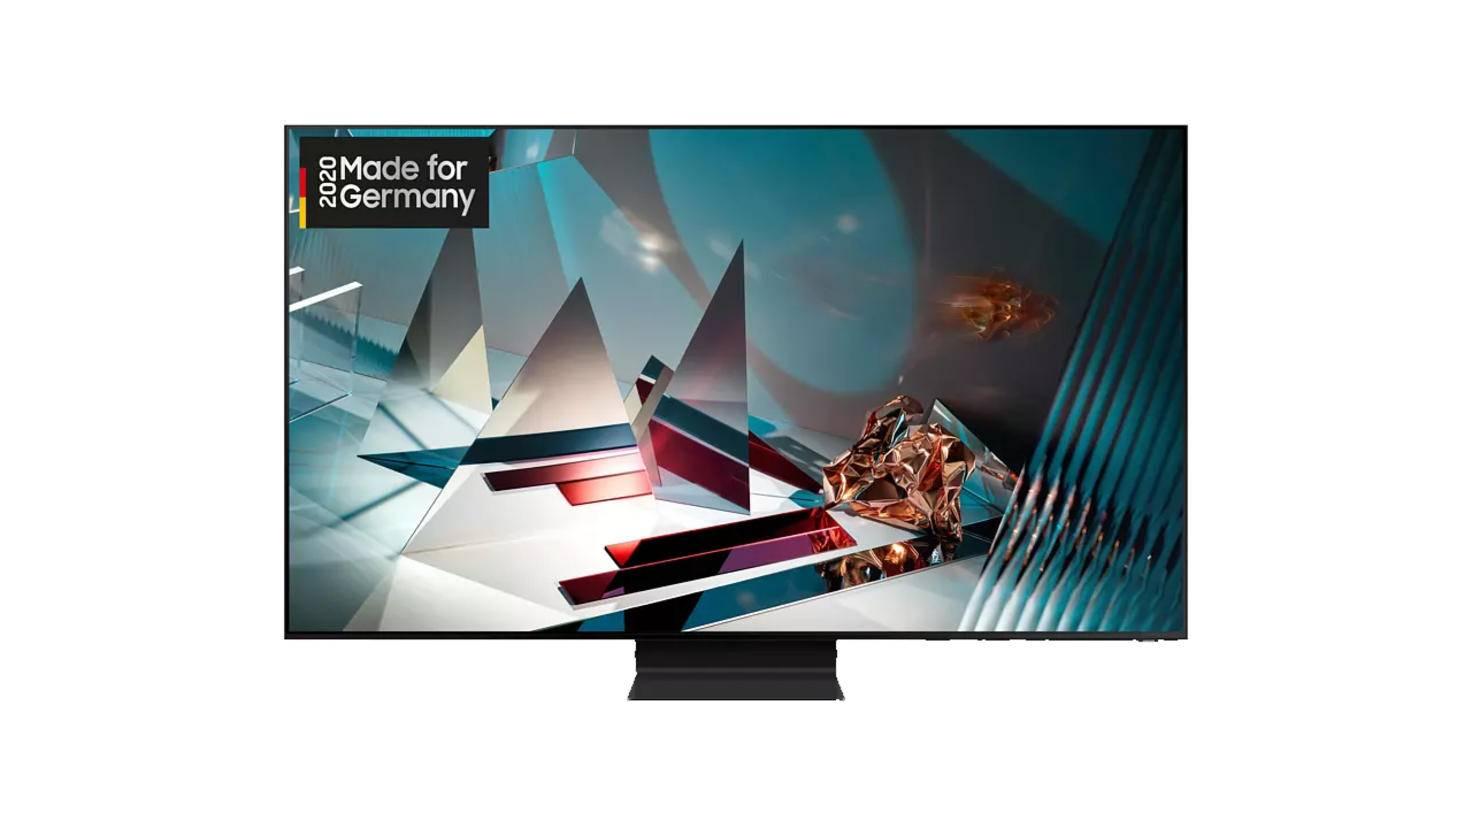 Samsung GQ65Q800T 8K TV 65 inches